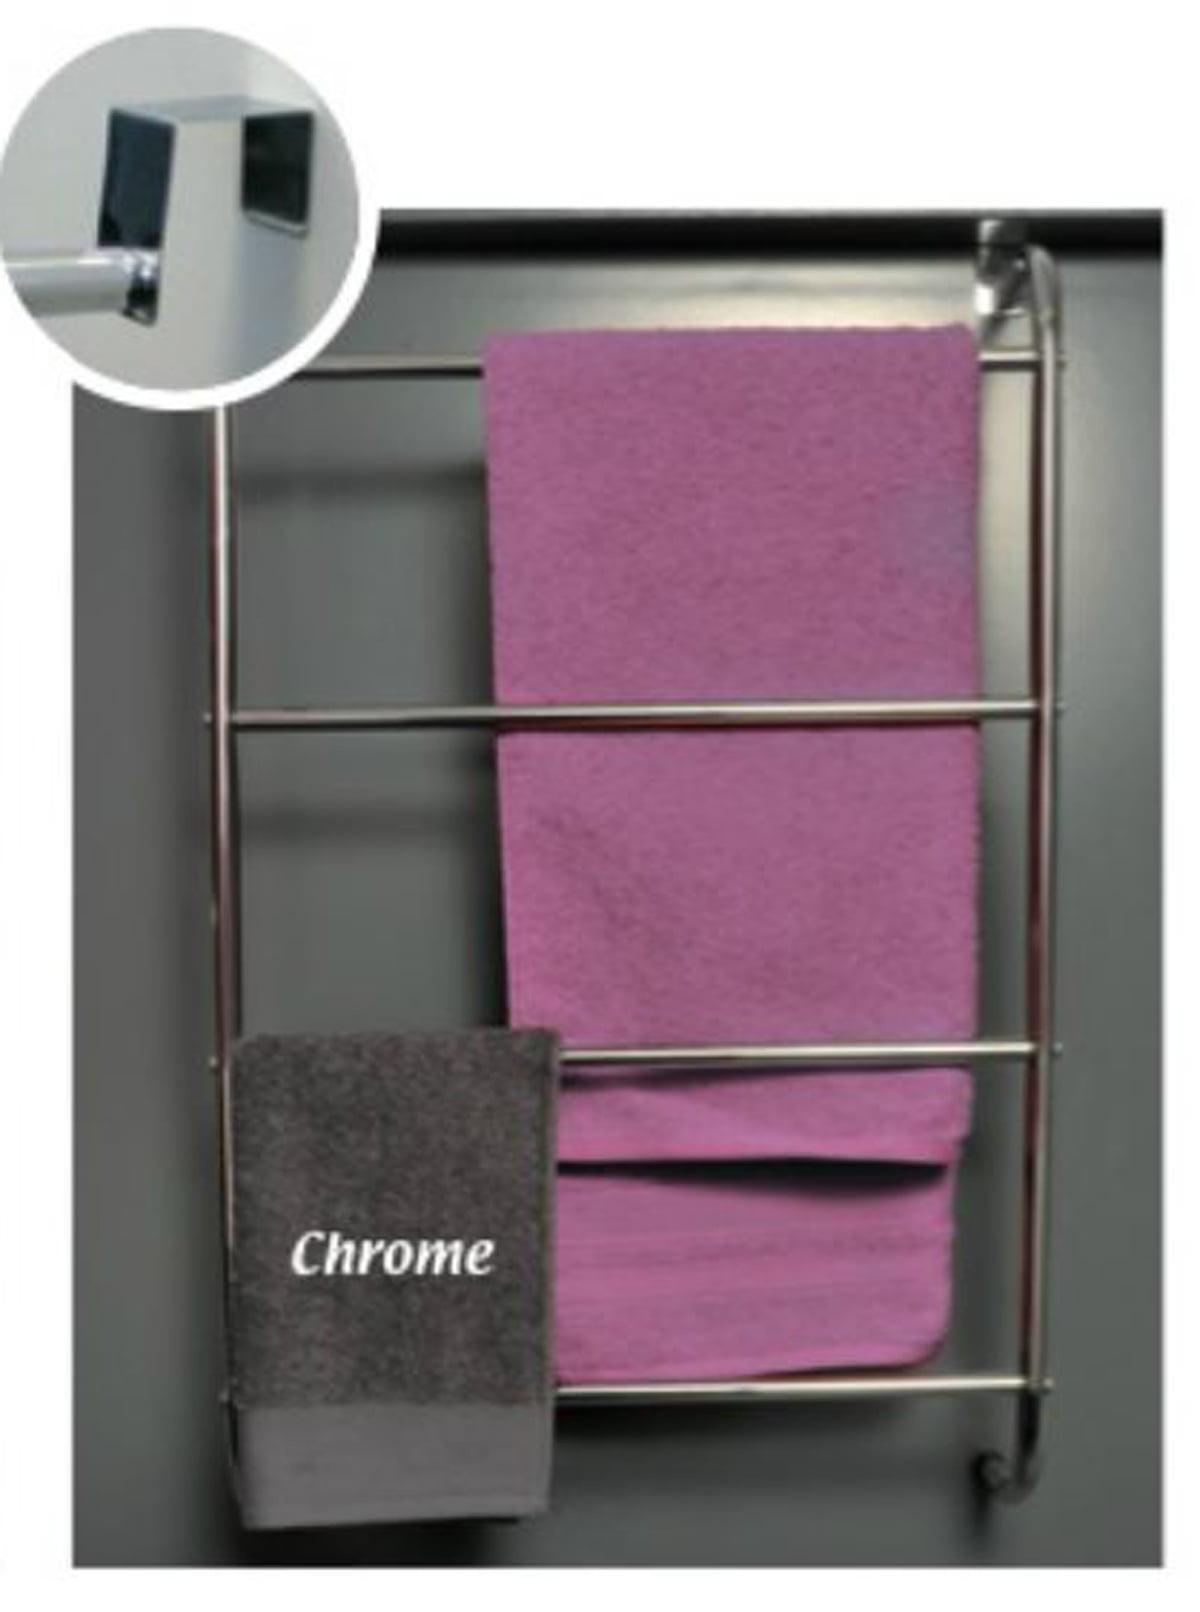 Over-The-Door 4 Bathroom Metal Towel Bars Organizer Rack Color Chrome by Evideco